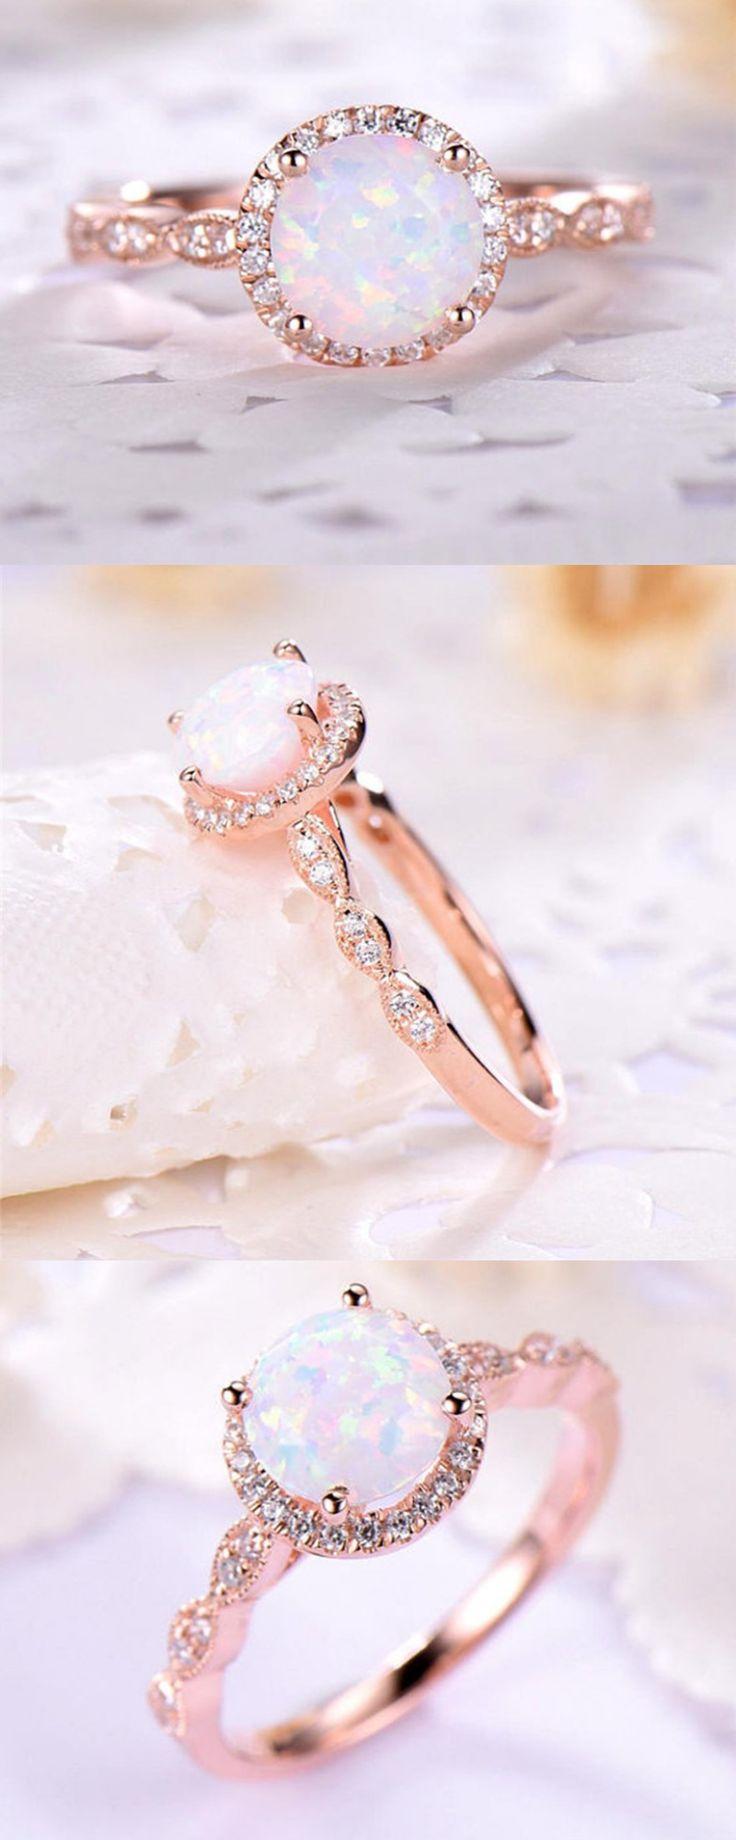 Fire Rose Opal Ring u00a0 u00a0*FREE WORLDWIDE SHIPPING*u00a0 Modern yet roma…